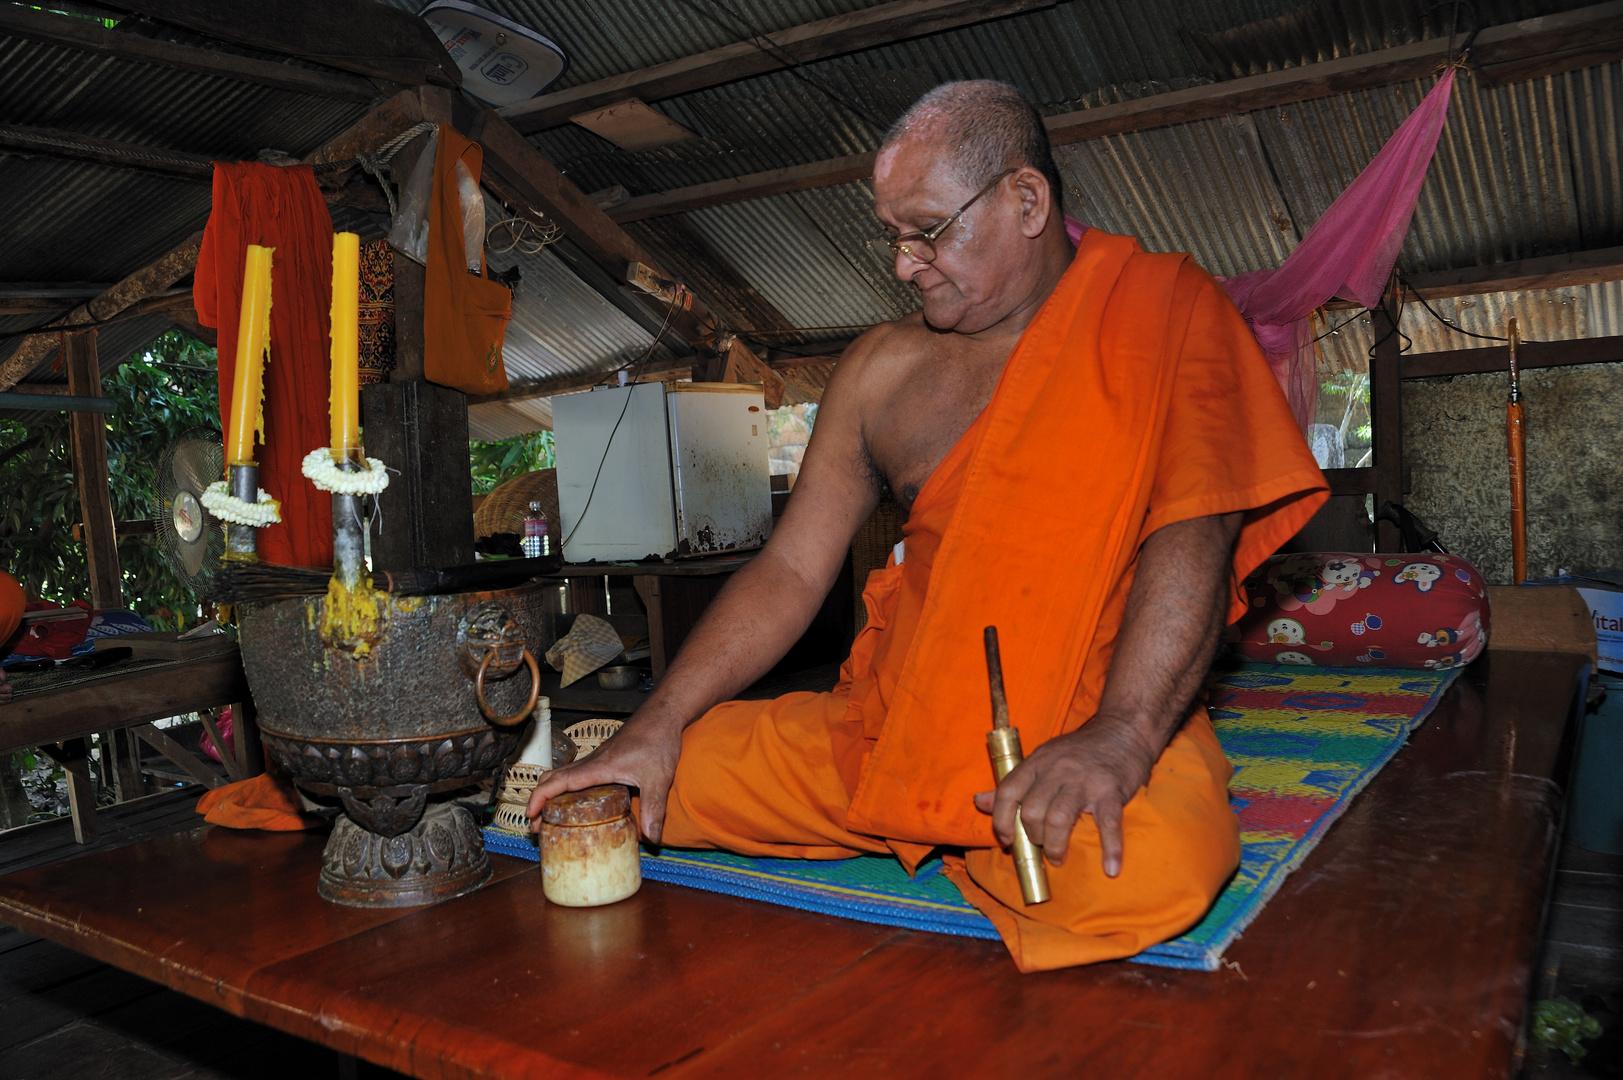 The Monk of the Athvea Pagoda 02